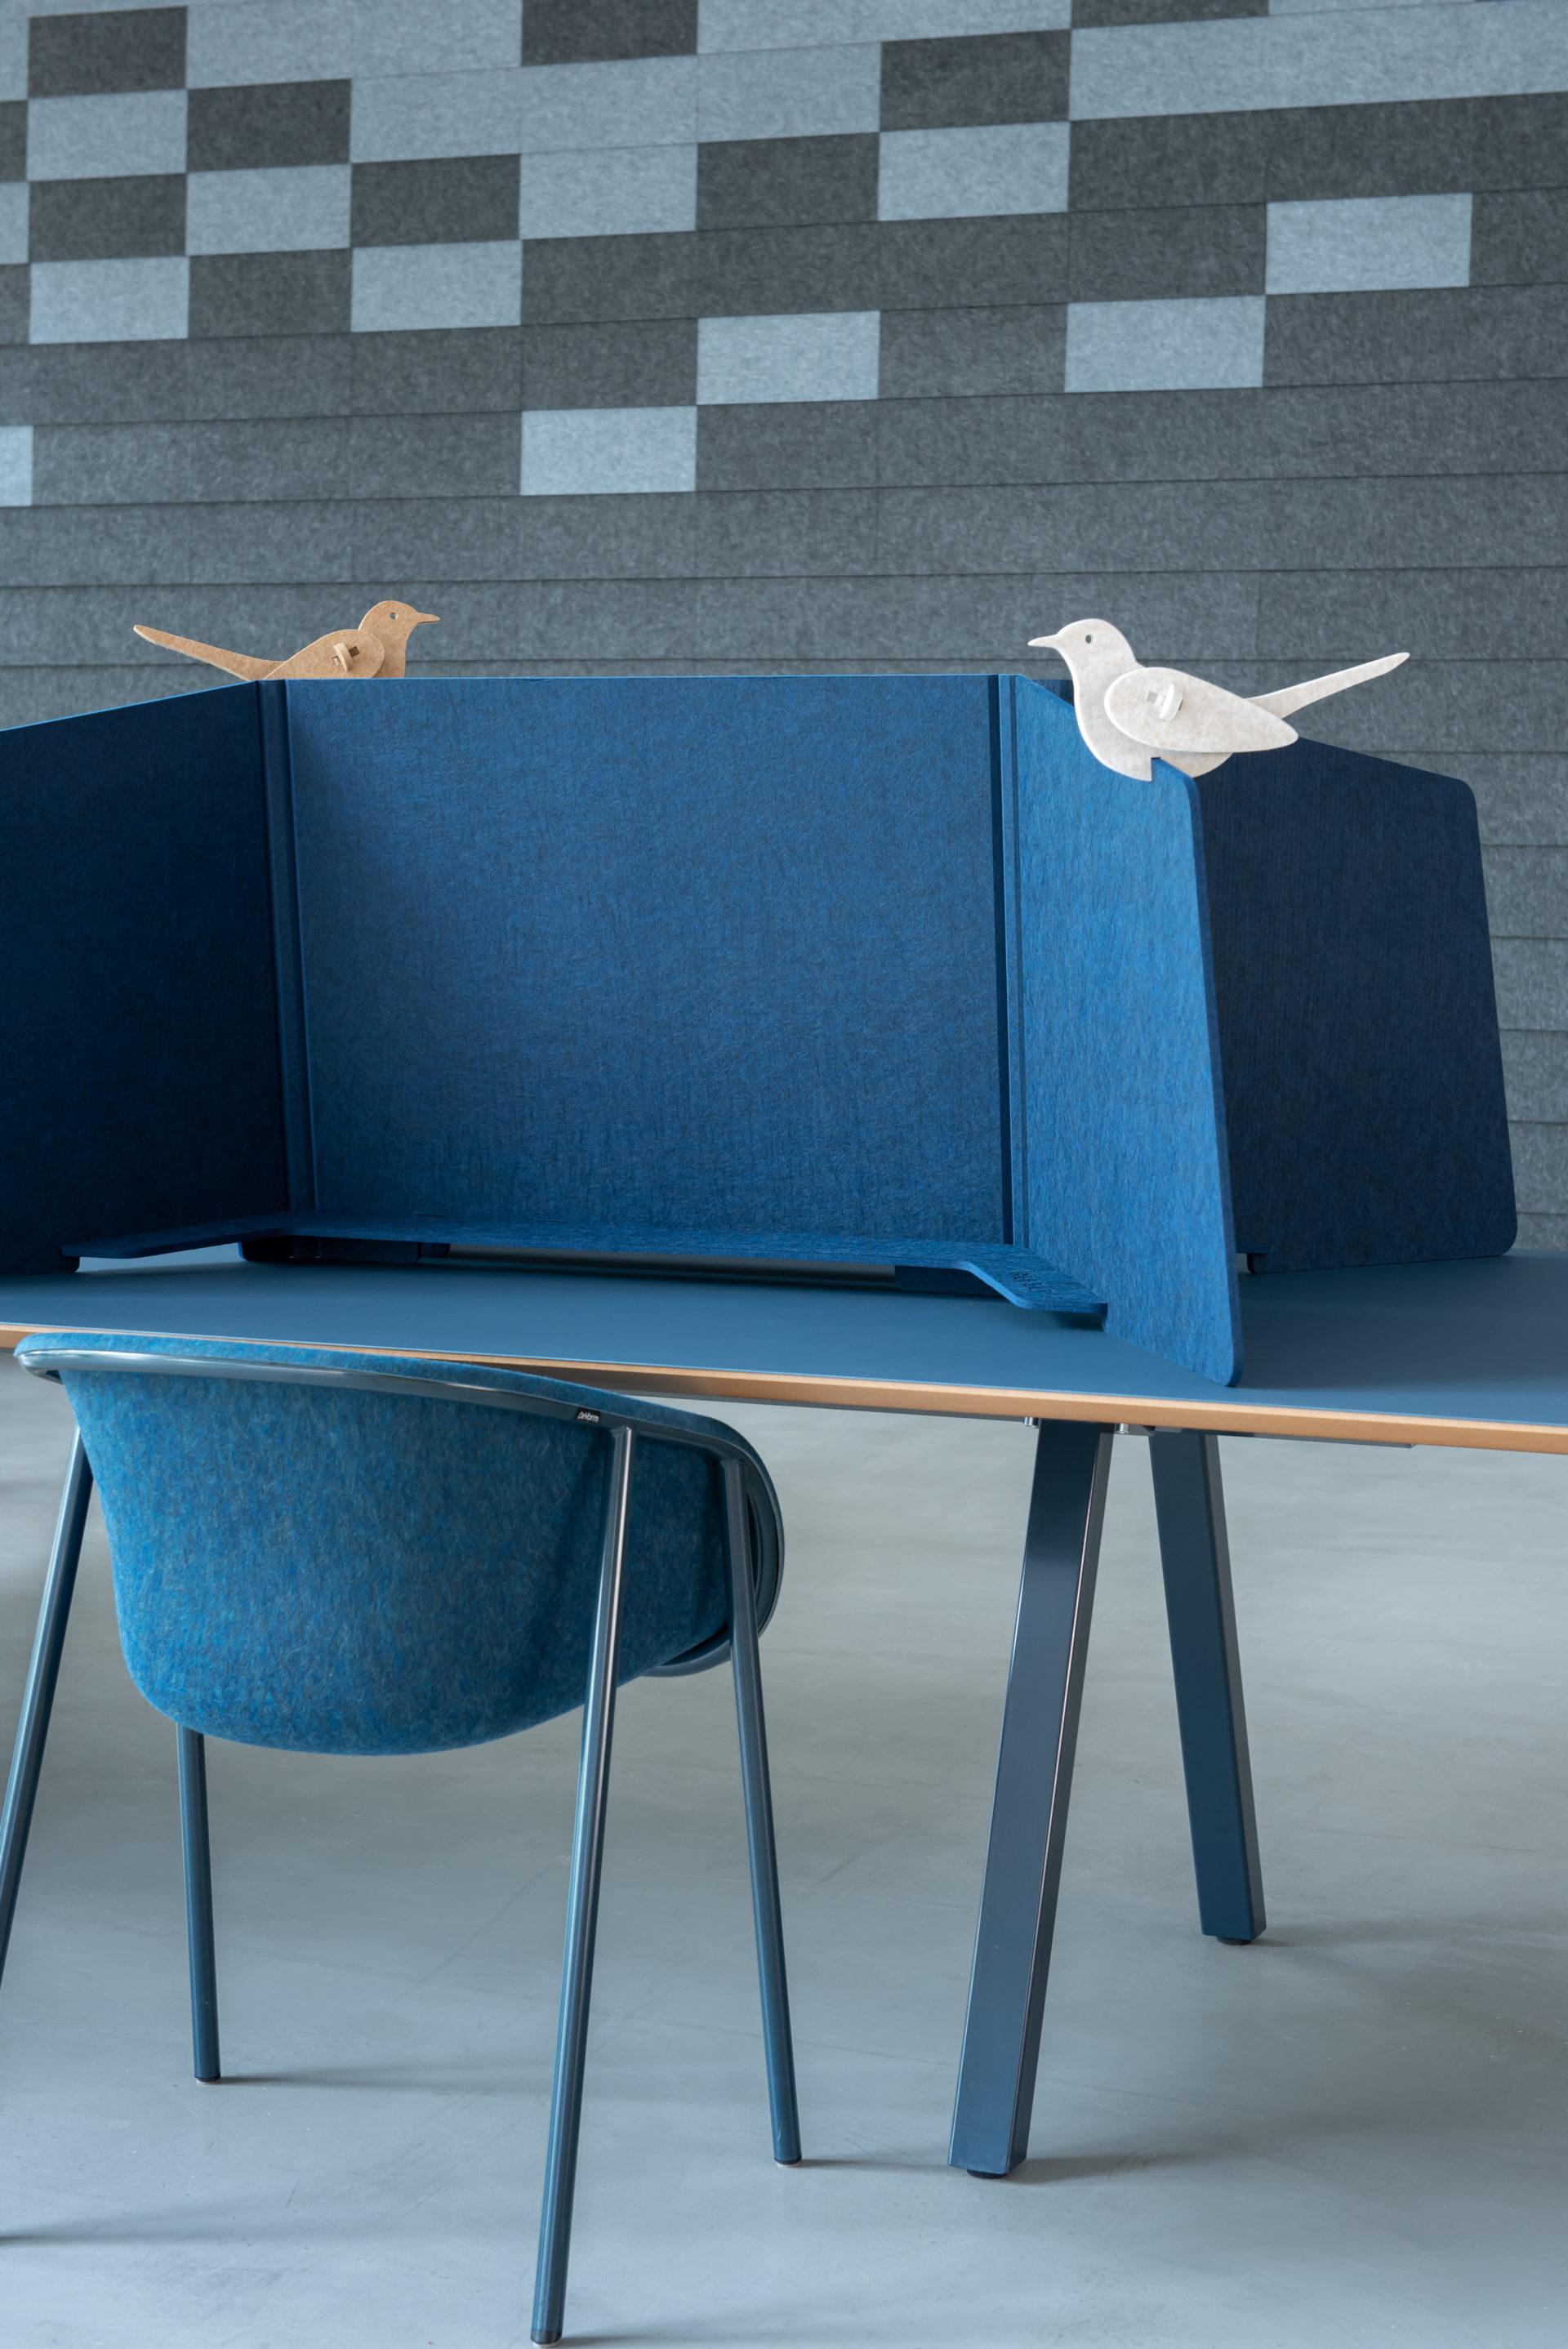 ReFelt PET Felt Workplace Divider 1.5m blue 1